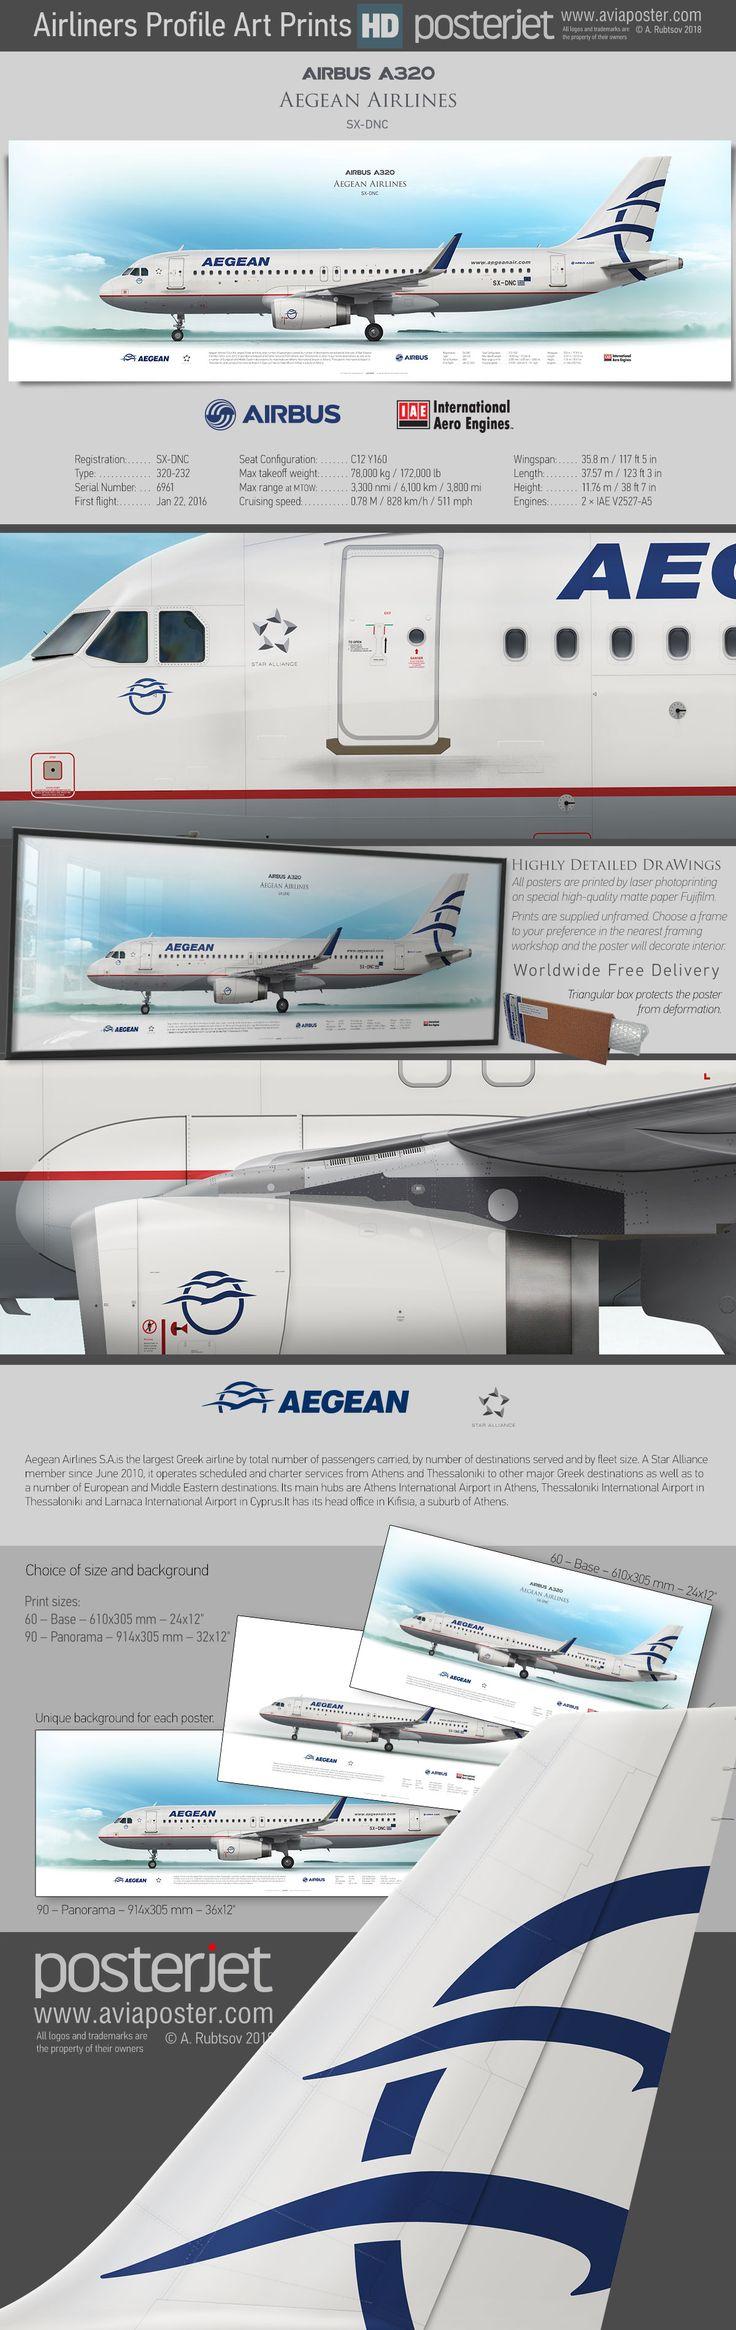 Airbus A320 Aegean Airlines SX-DNC | www.aviaposter.com | #aviation #jetliner #airplane #pilot #aviationlovers #avgeek #jet #airport #pilotlife #cabincrew